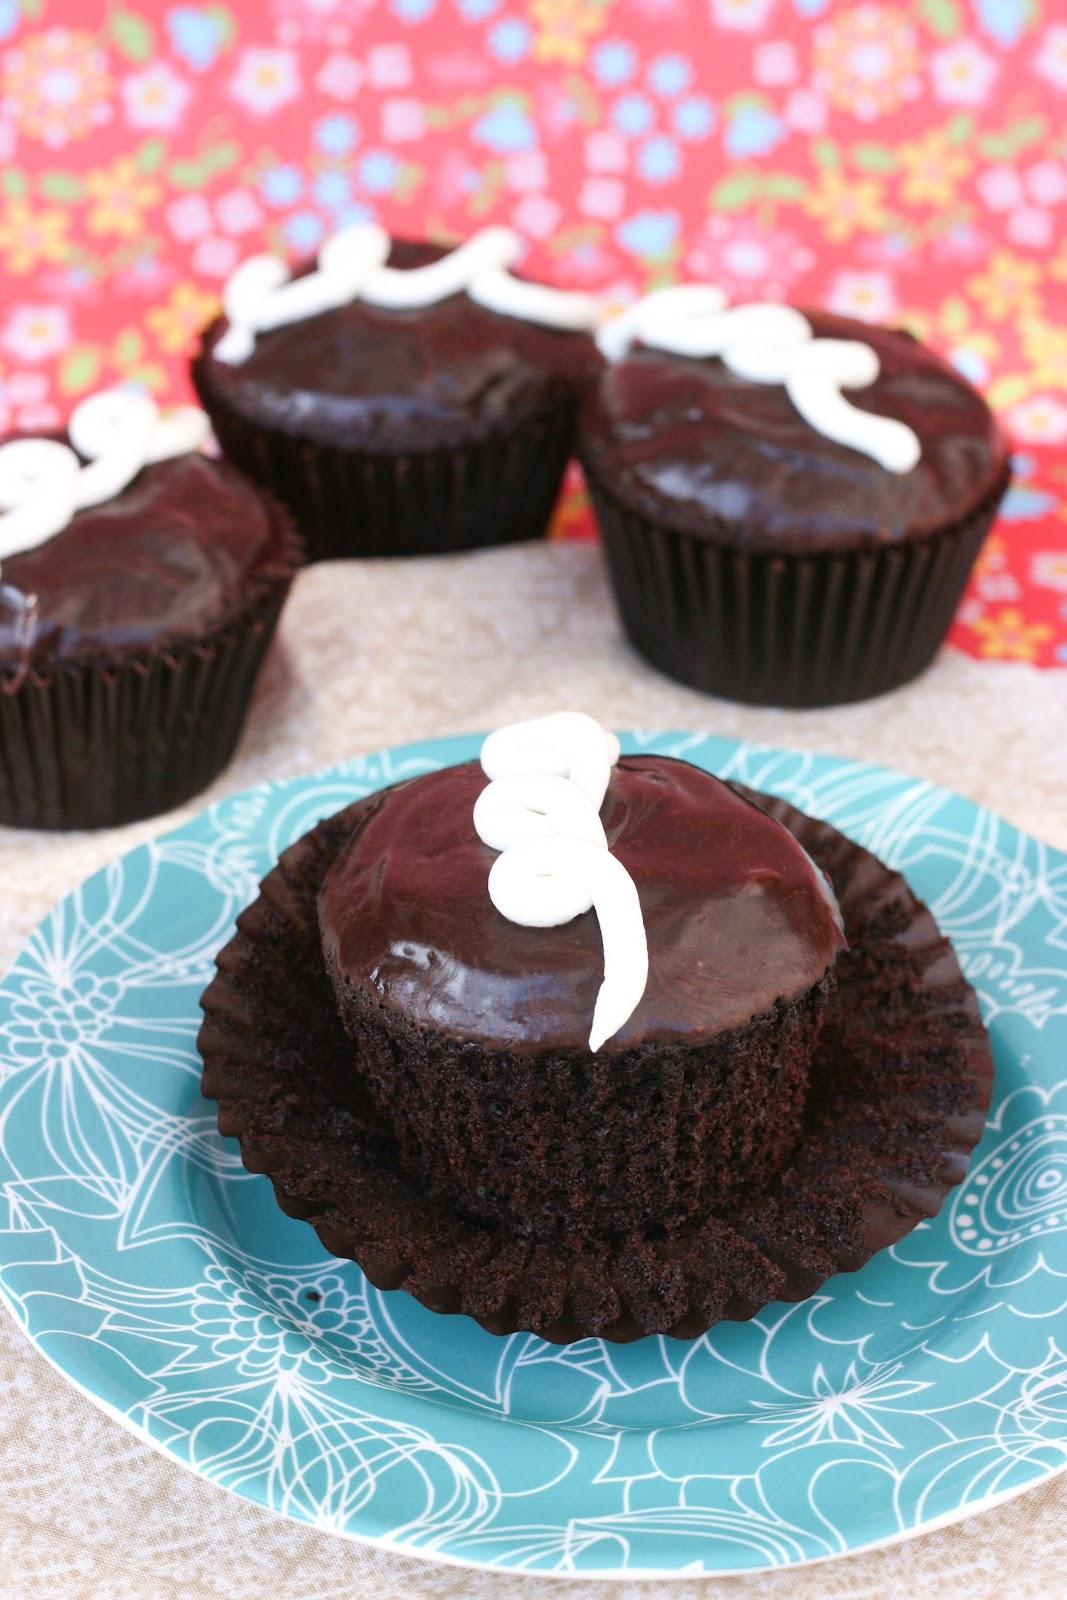 Homemade Hostess Cupcakes   Krissy's Creations